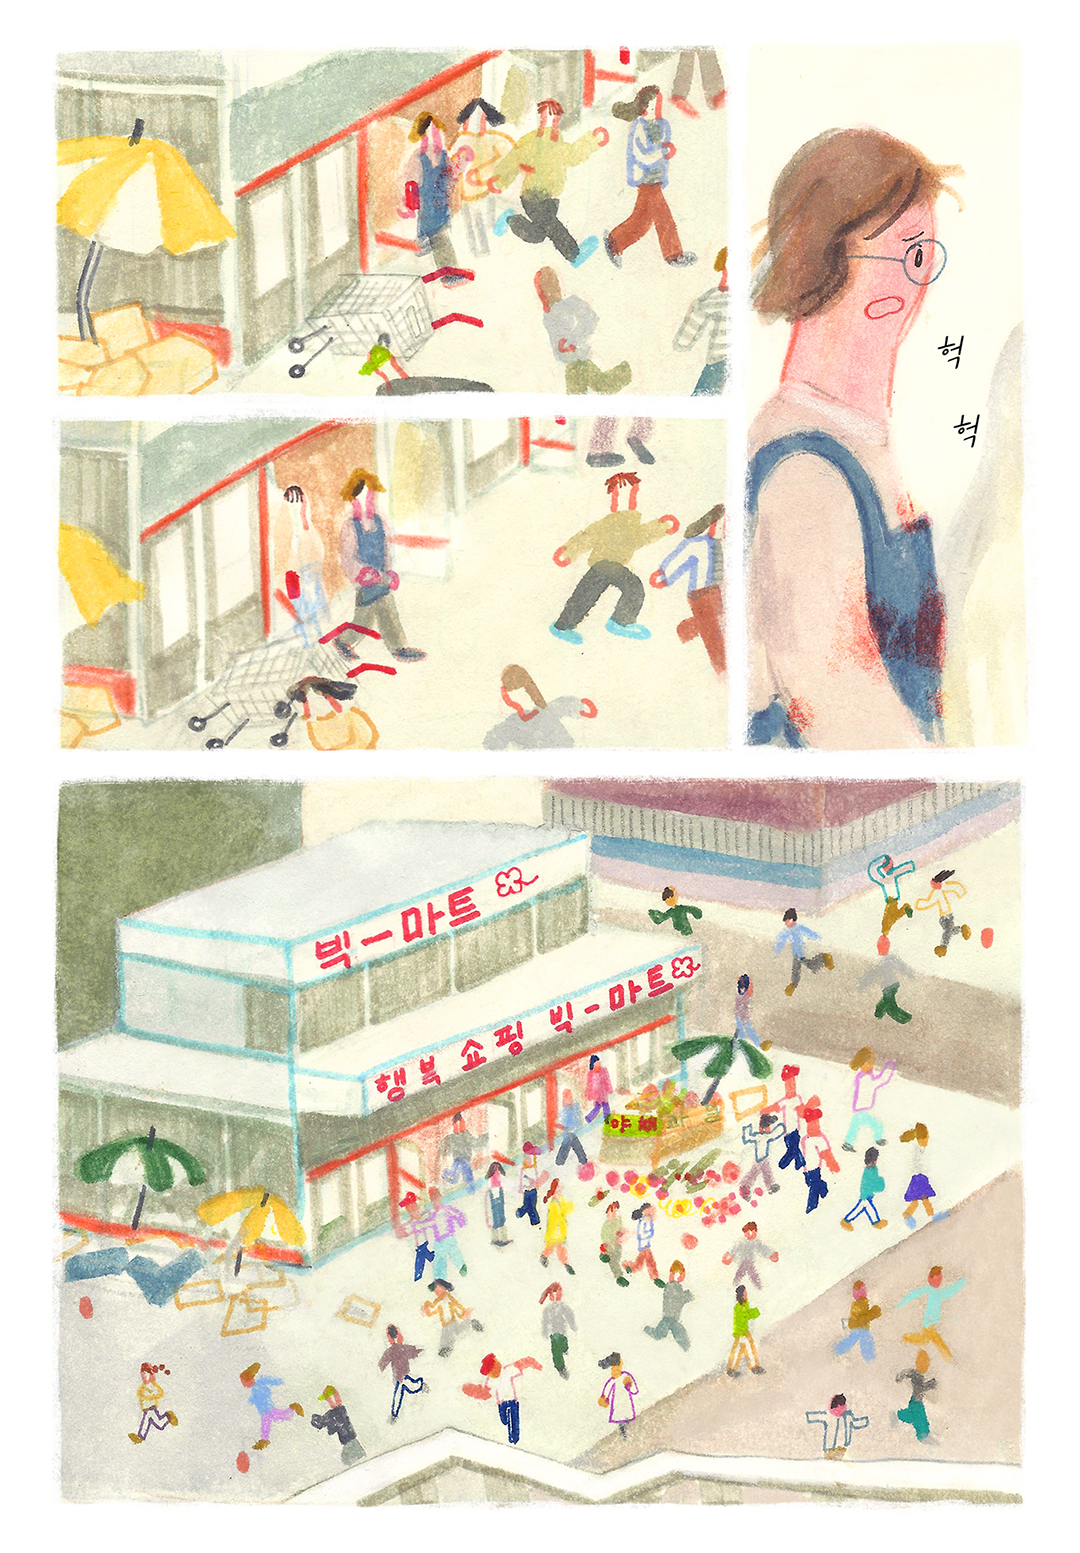 GirlsclubAsia-Artist-Yoojin Ahn-10